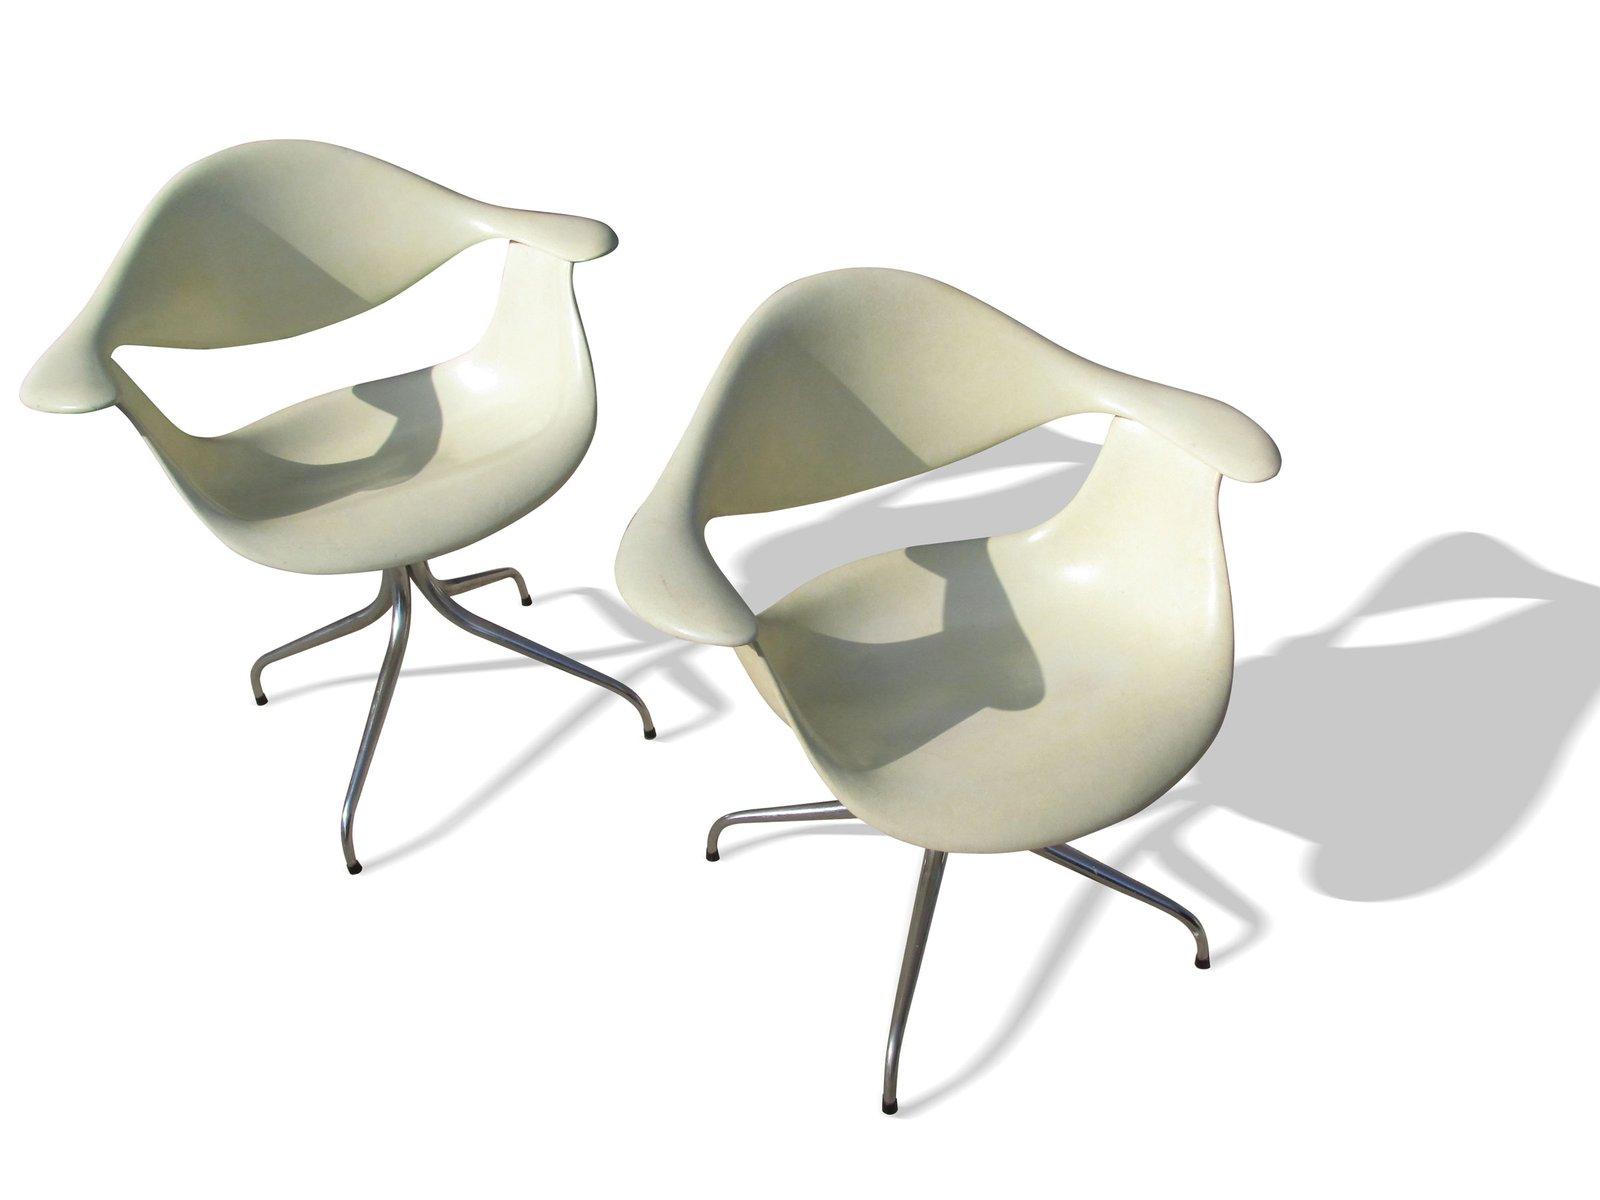 daf stuhl von charles pollock f r herman miller bei pamono kaufen. Black Bedroom Furniture Sets. Home Design Ideas